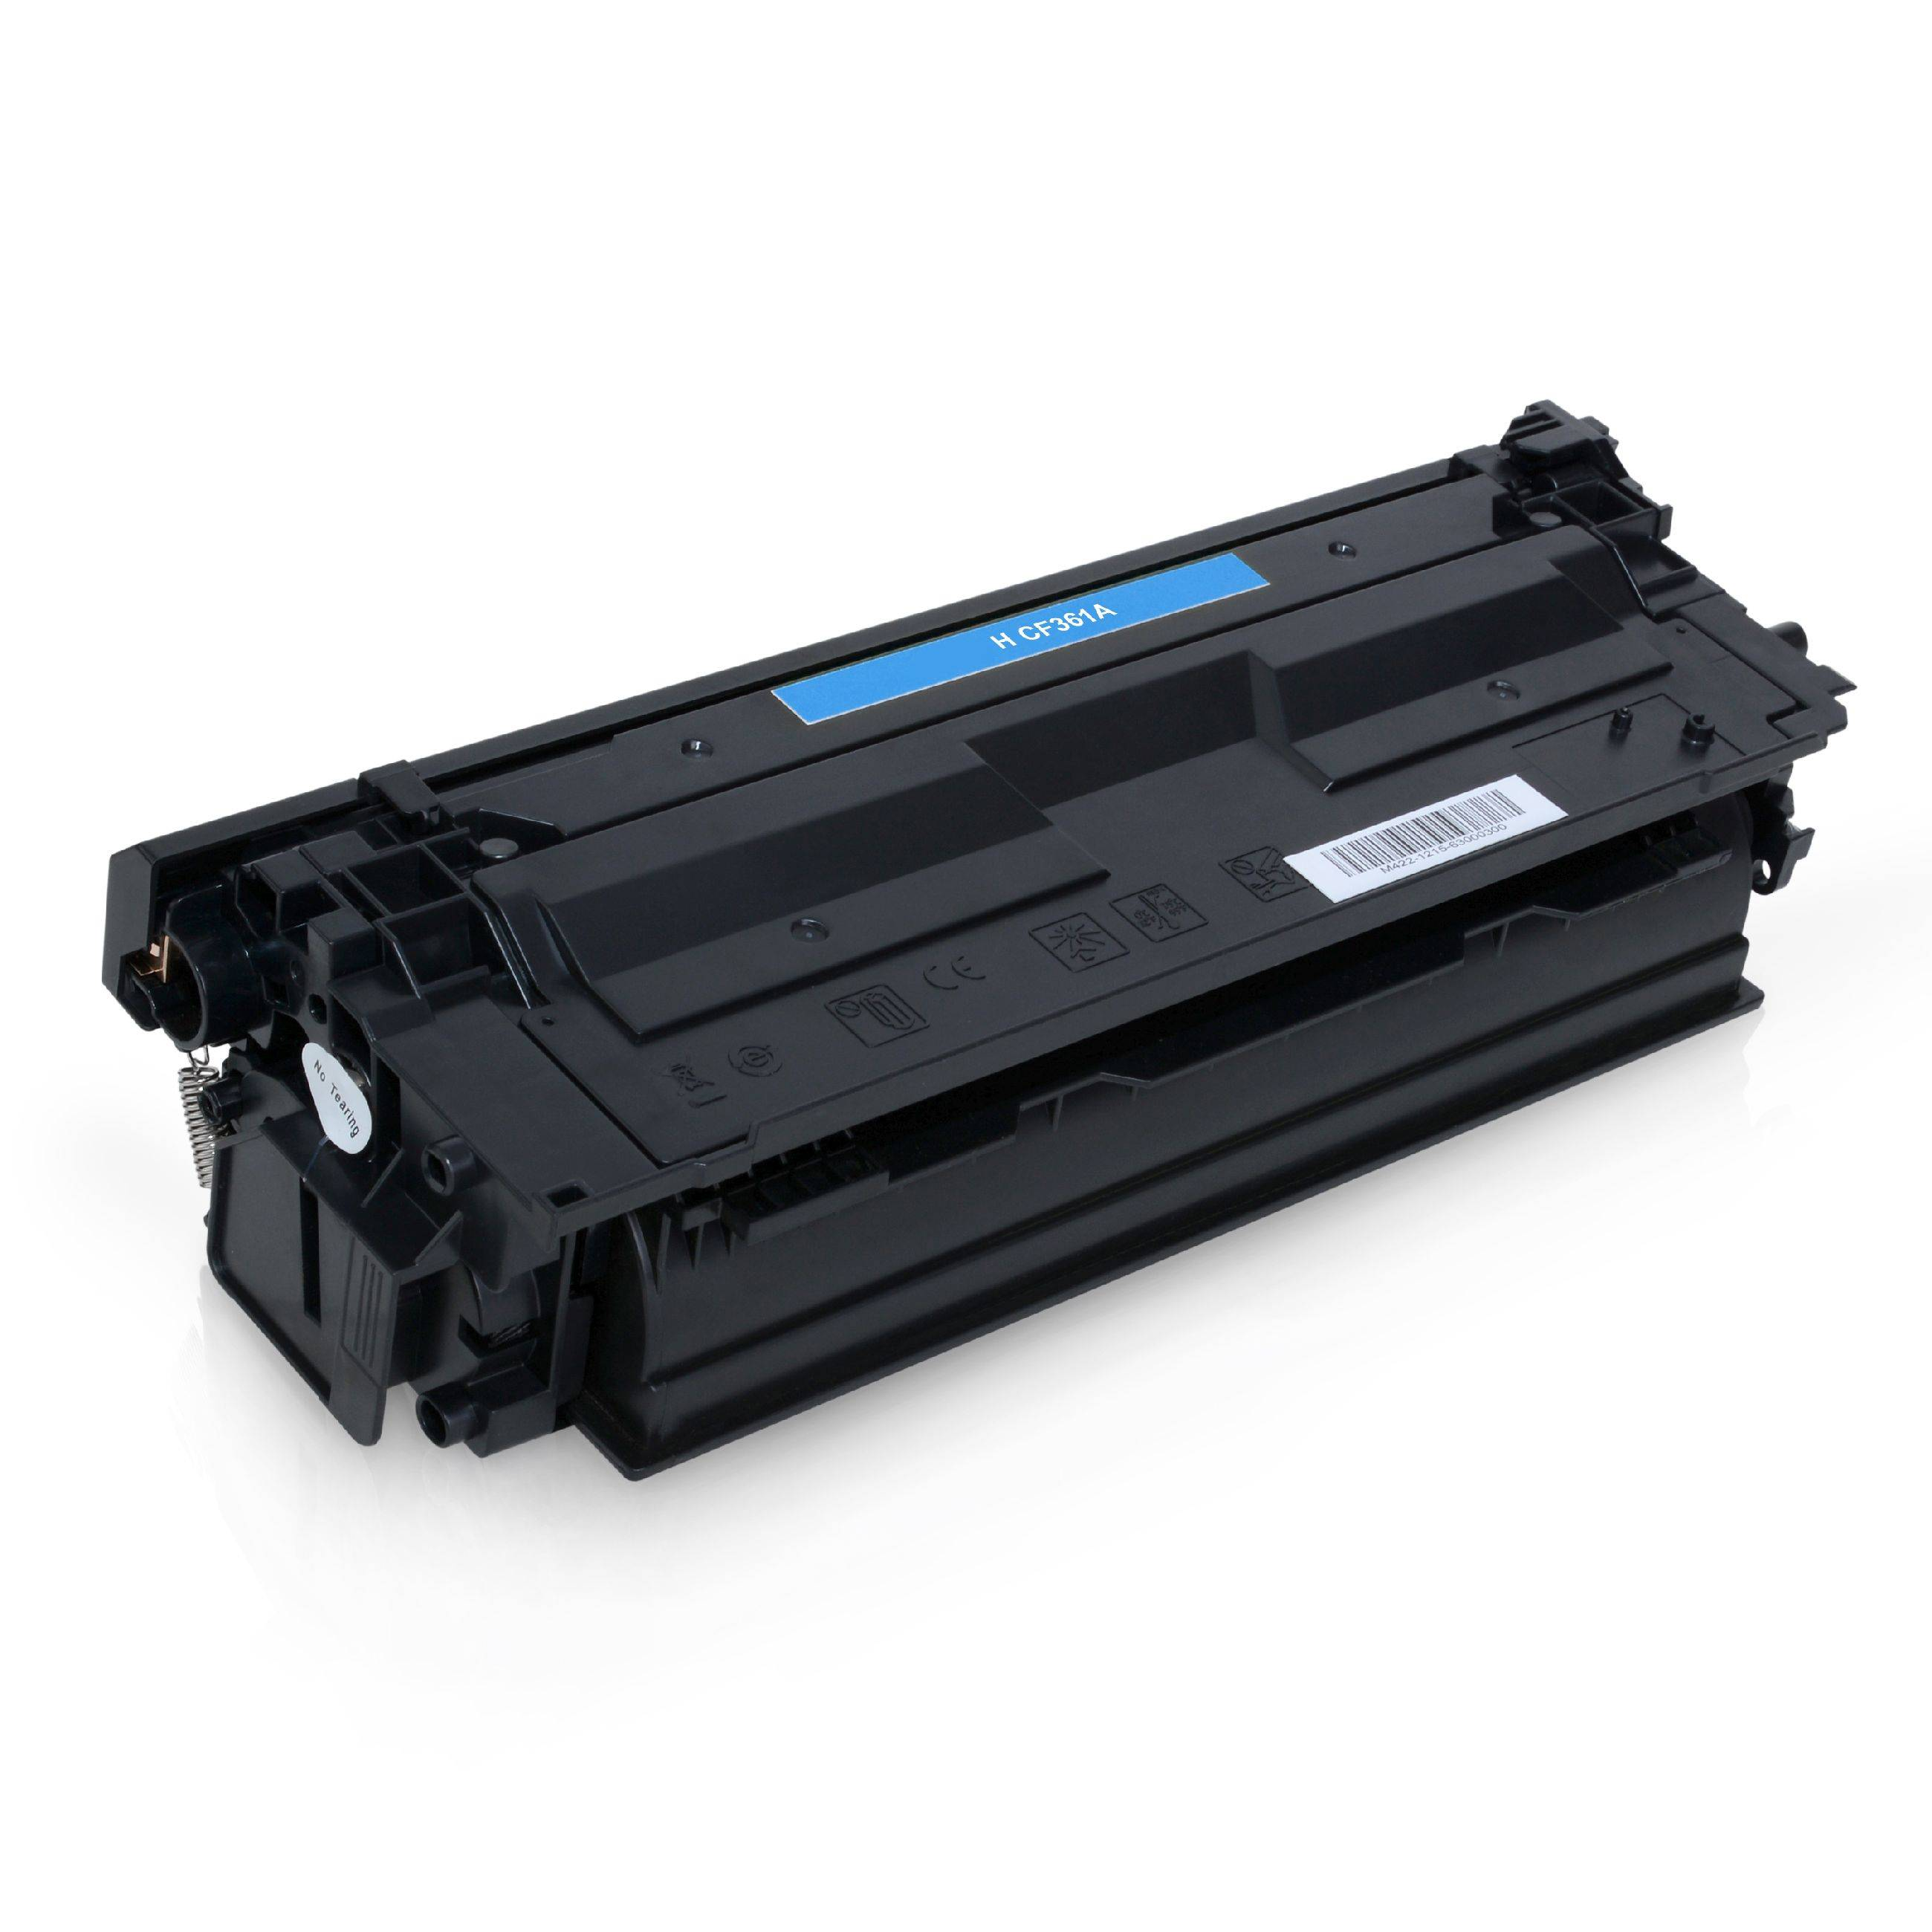 HP Cartouche de Toner pour HP CF361A / 508A cyan compatible (de marque ASC)